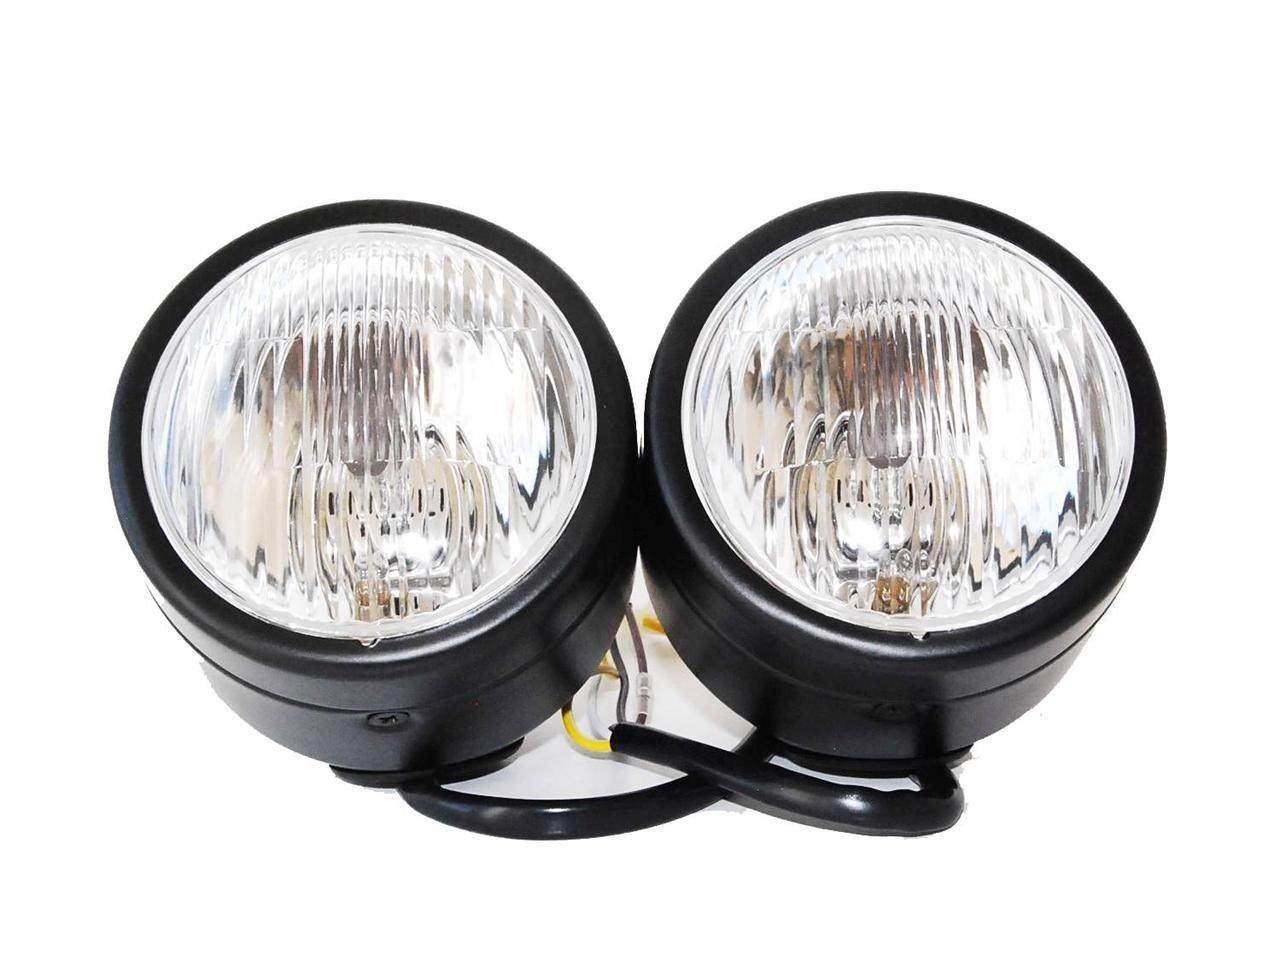 61JvMTm3%2B7L._SL1280_ amazon com black twin headlight motorcycle double dual lamp dominator twin headlight wiring diagram at readyjetset.co